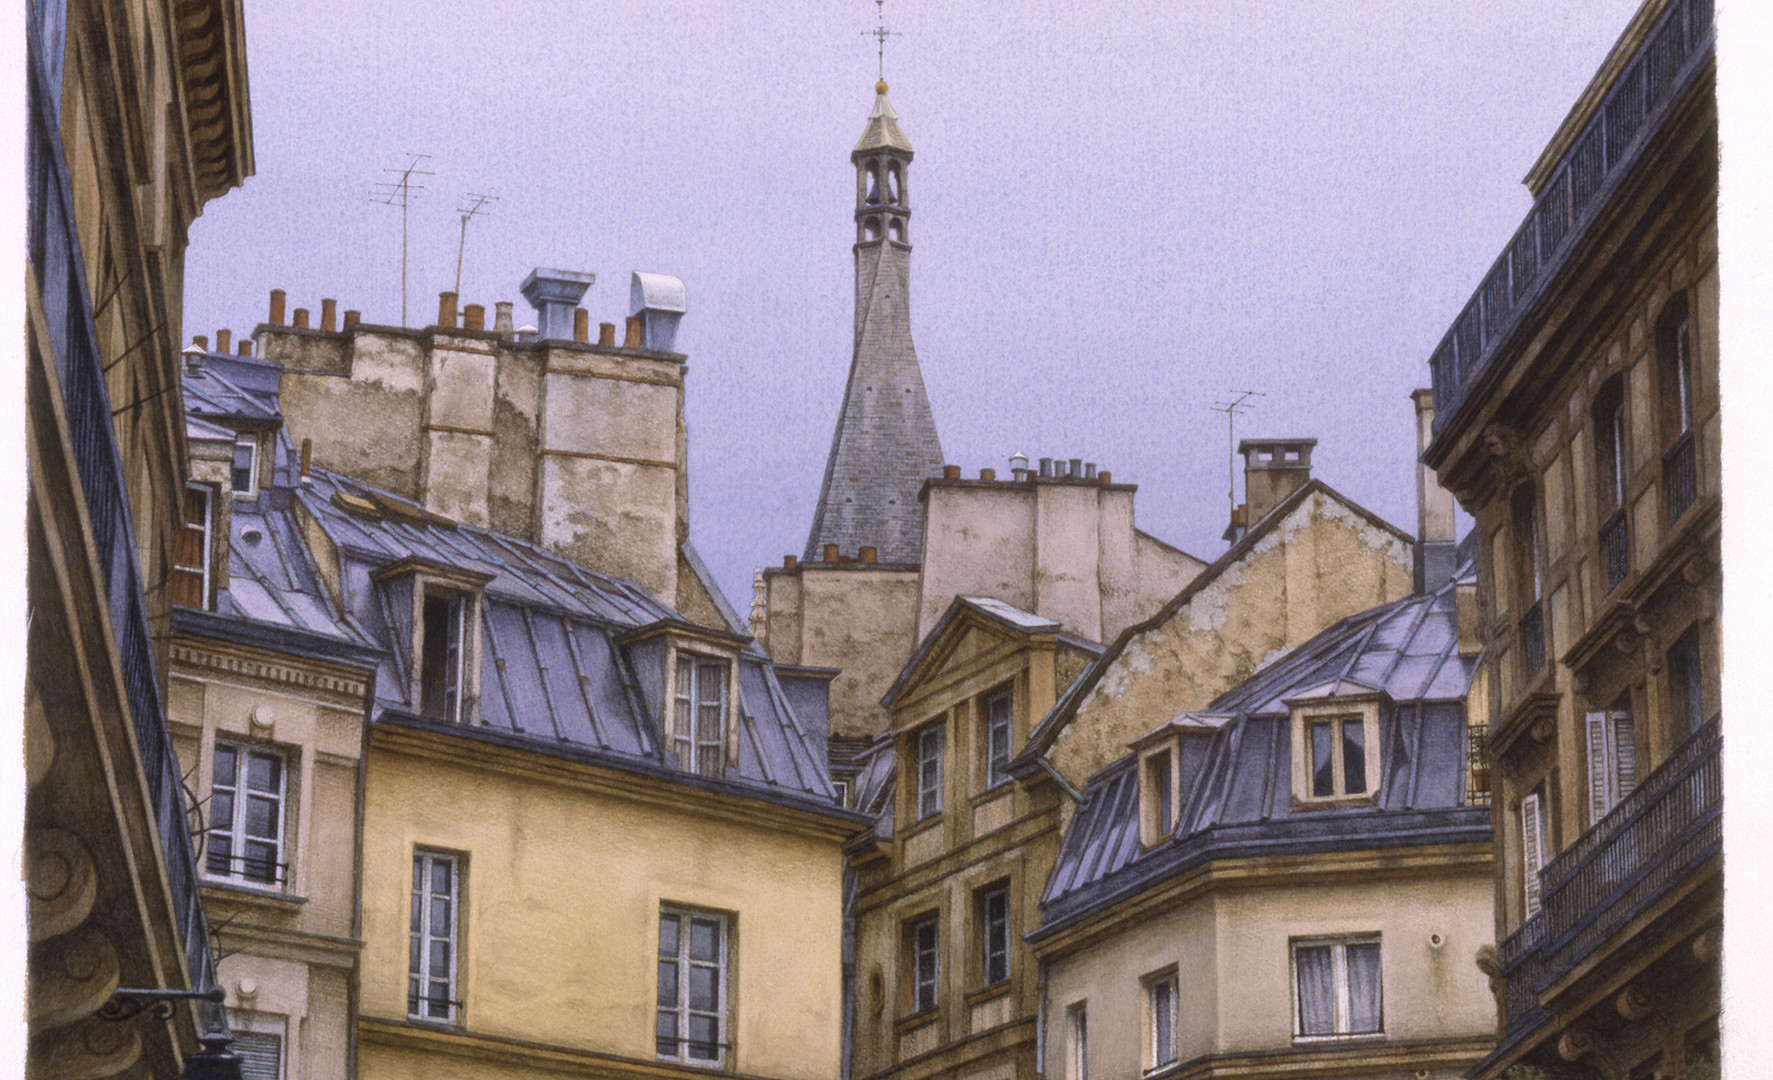 St. Severin. Rooftops, 2002